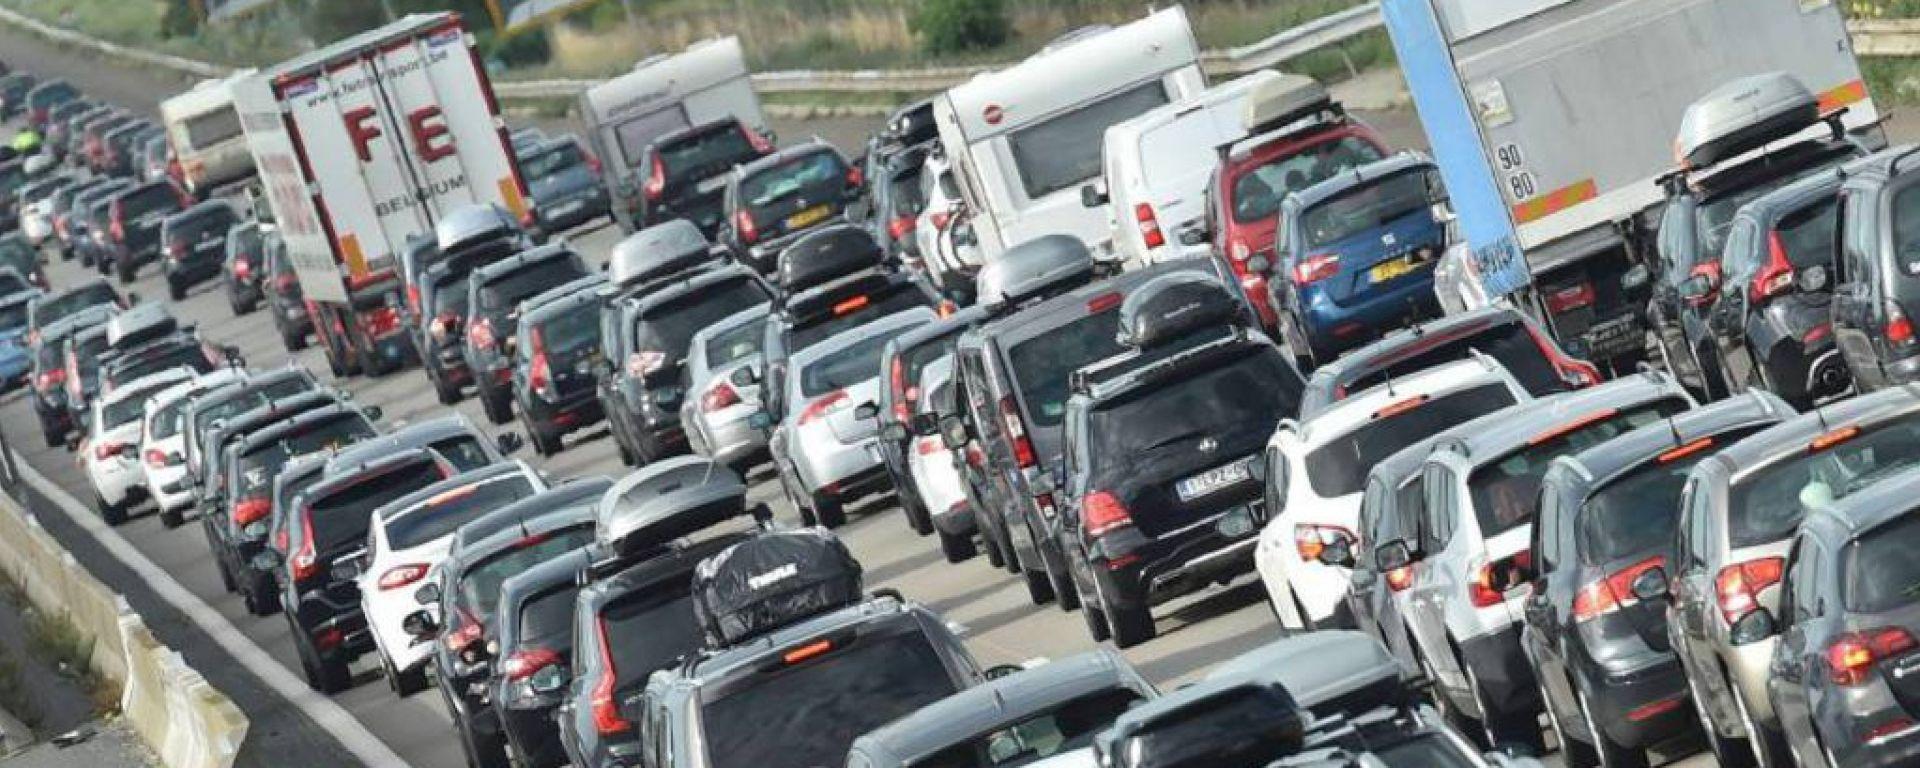 Calendario Traffico Autostrade.Previsioni Traffico E Meteo Autostrada Weekend 24 25 Agosto